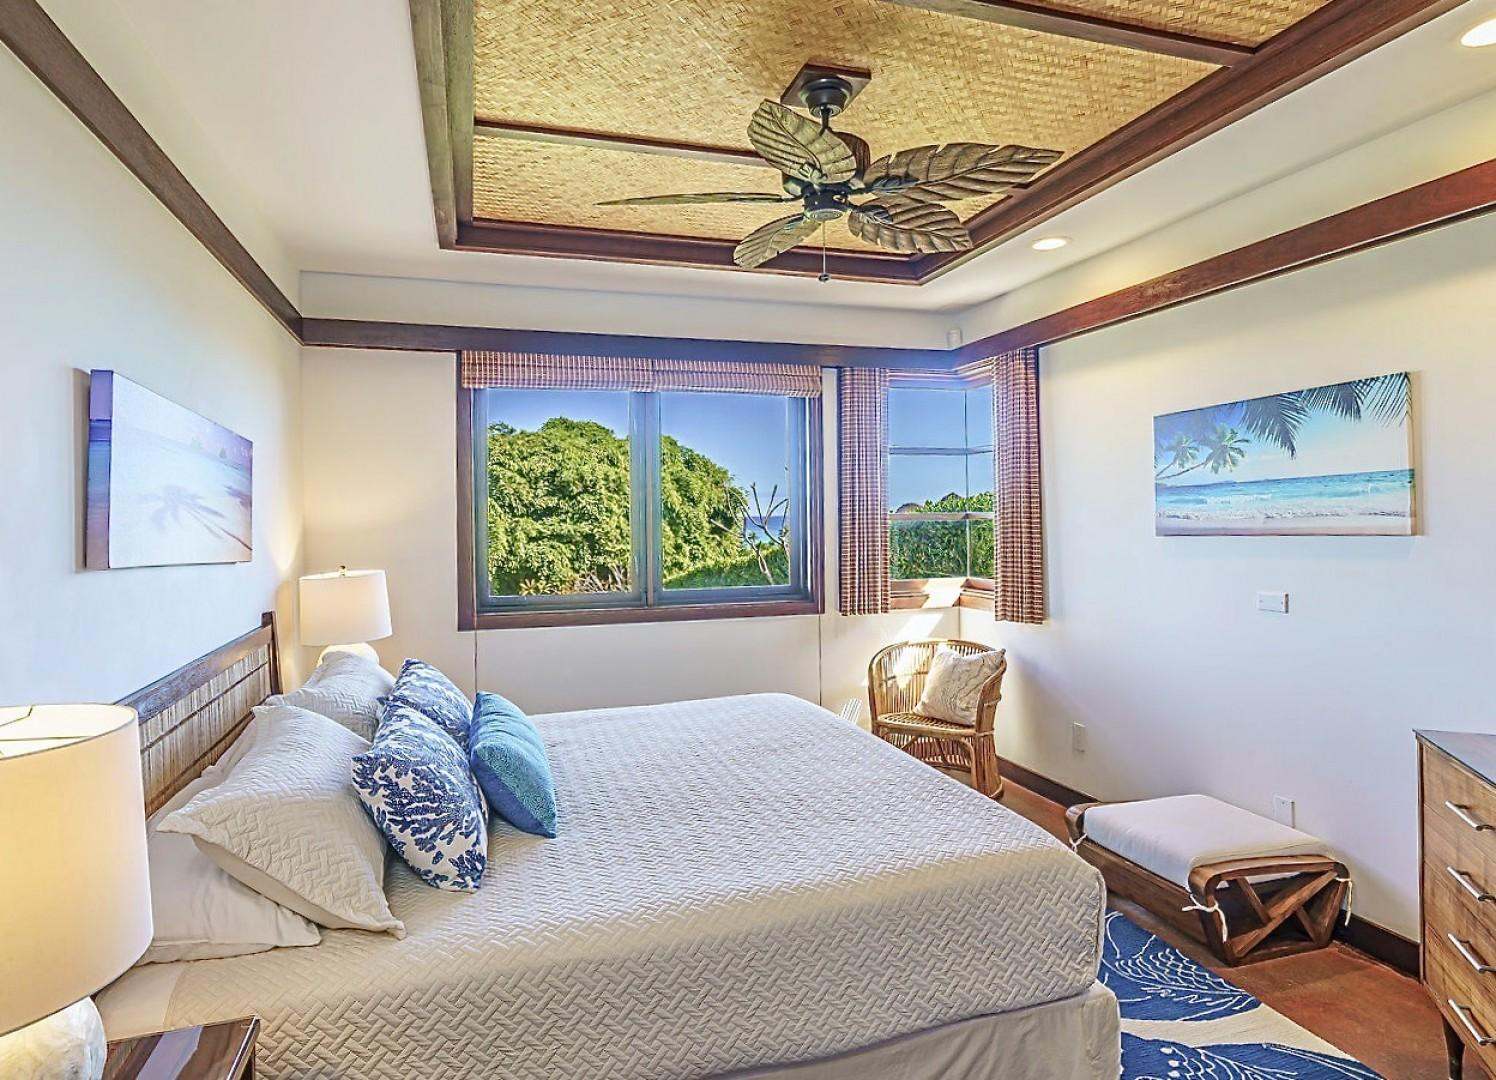 20 - Guest Bedroom King downstairs